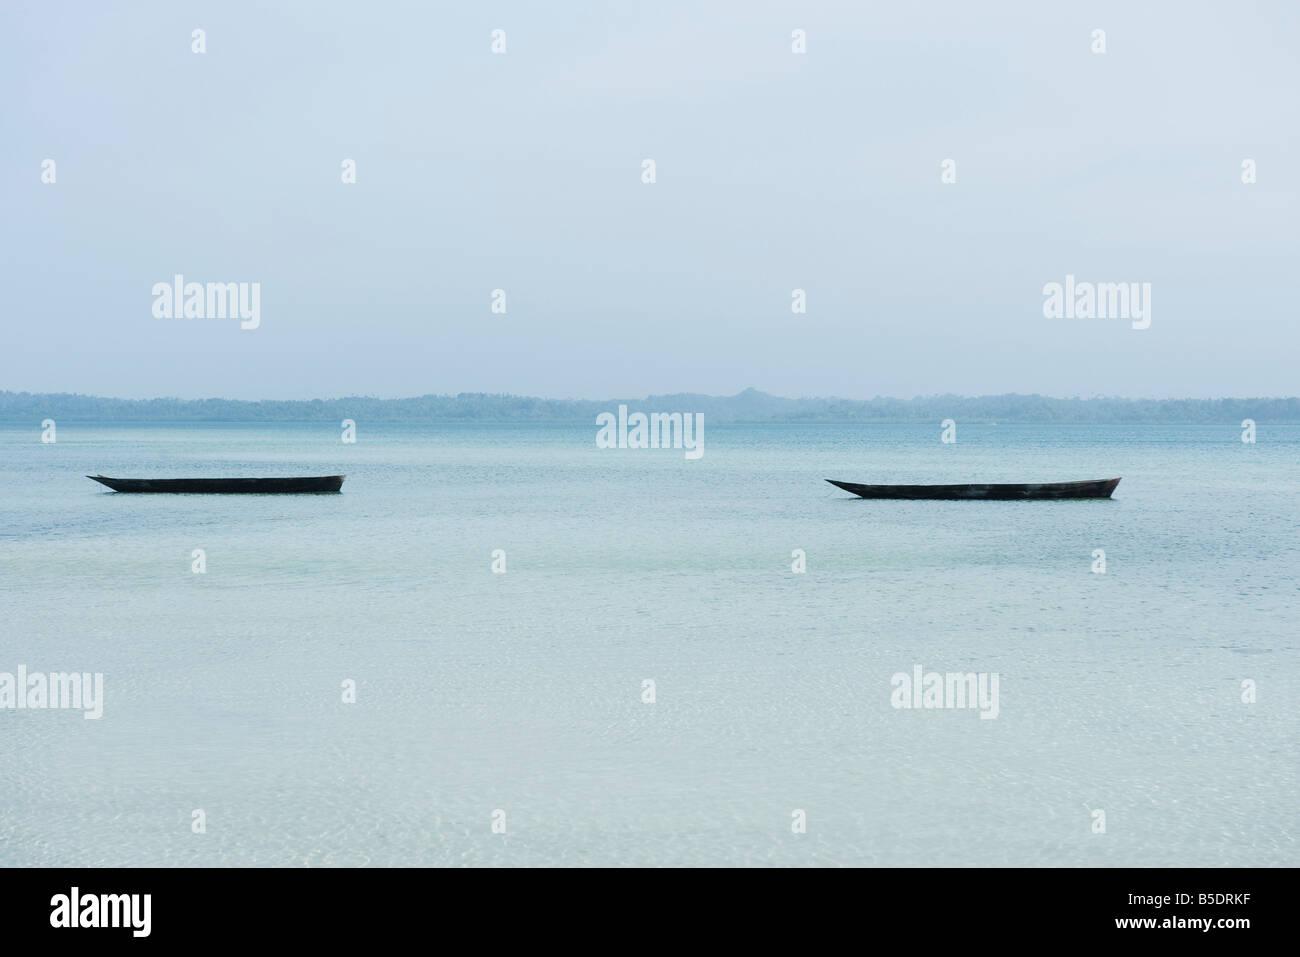 Tanzania, Zanzibar, dugout canoes - Stock Image